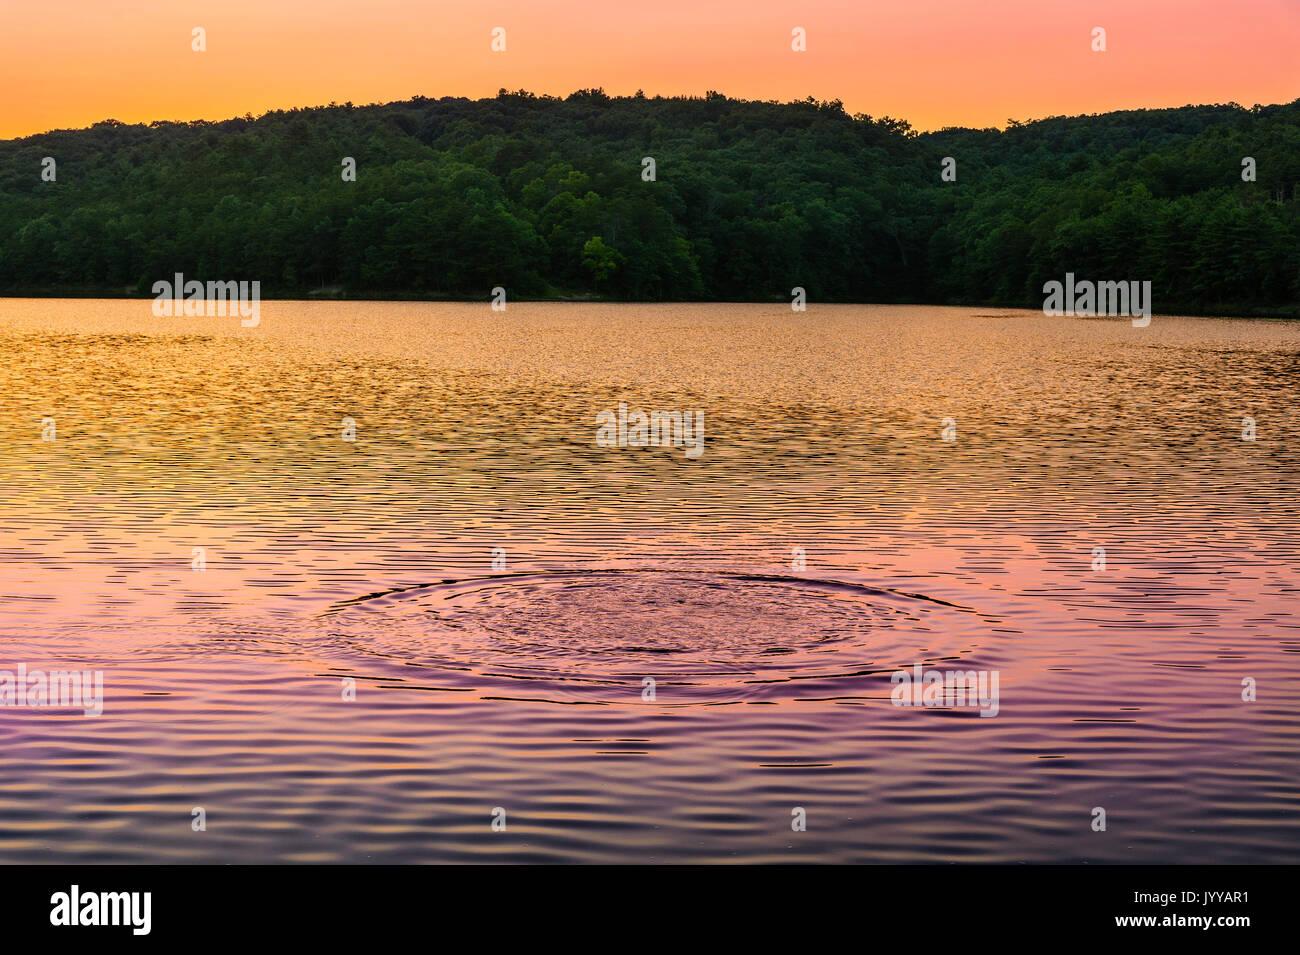 Colorful Circular Ripples On Lake At Sunset - Stock Image